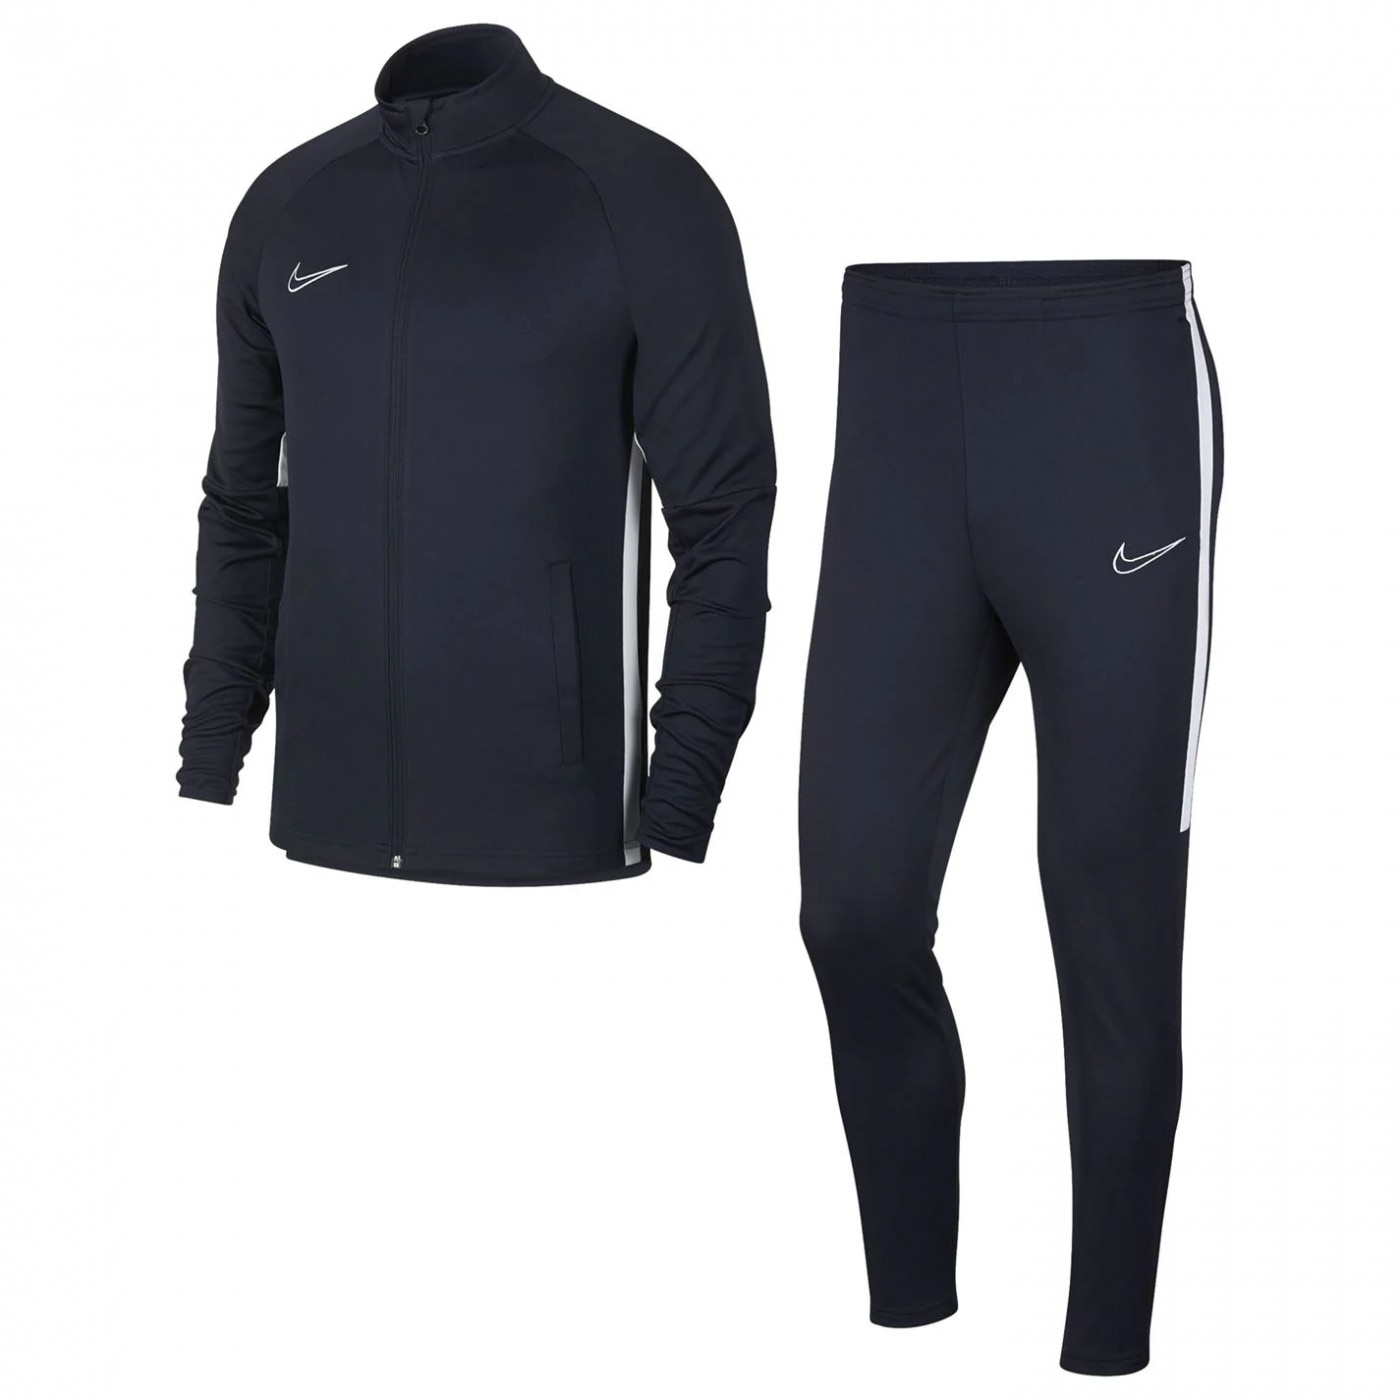 Meeste spordidressid Nike Dri-FIT Academy